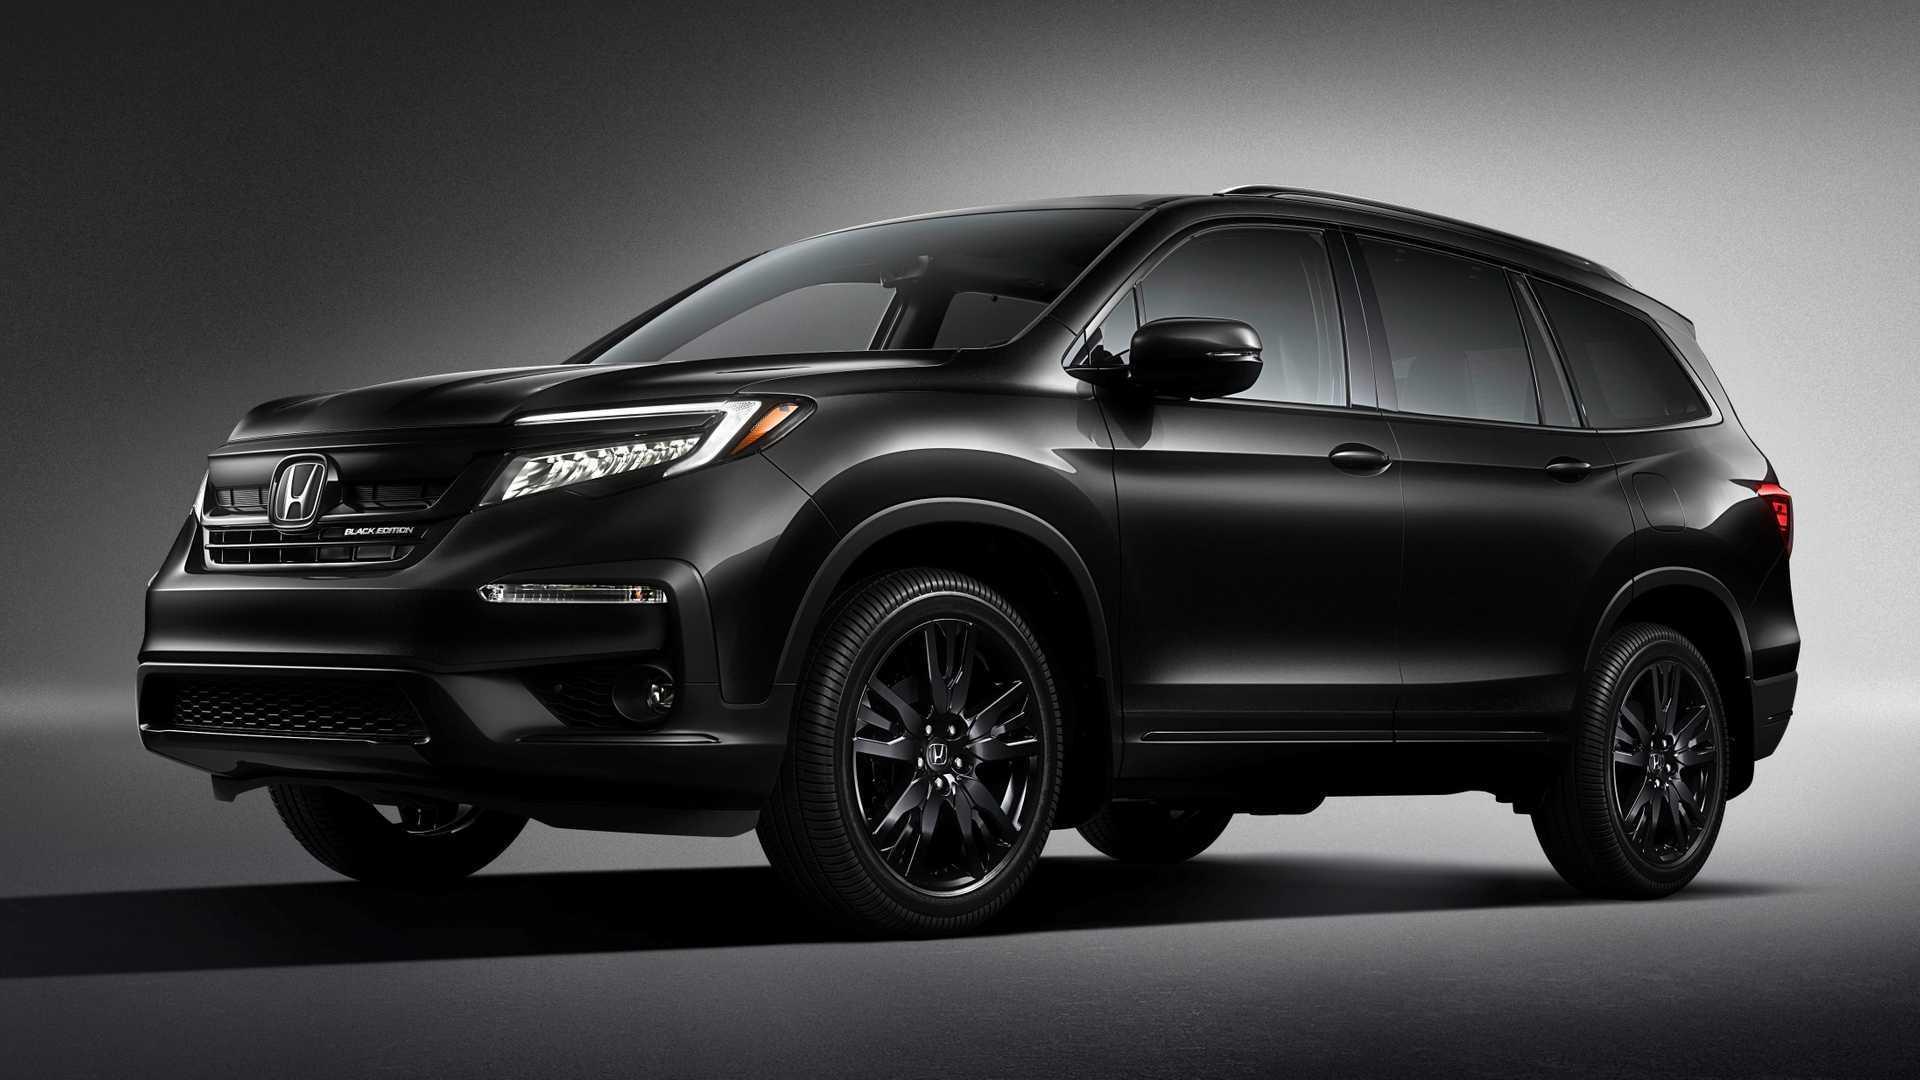 New Honda Pilot >> 2020 Honda Pilot Black Edition Is New Range Topping Trim